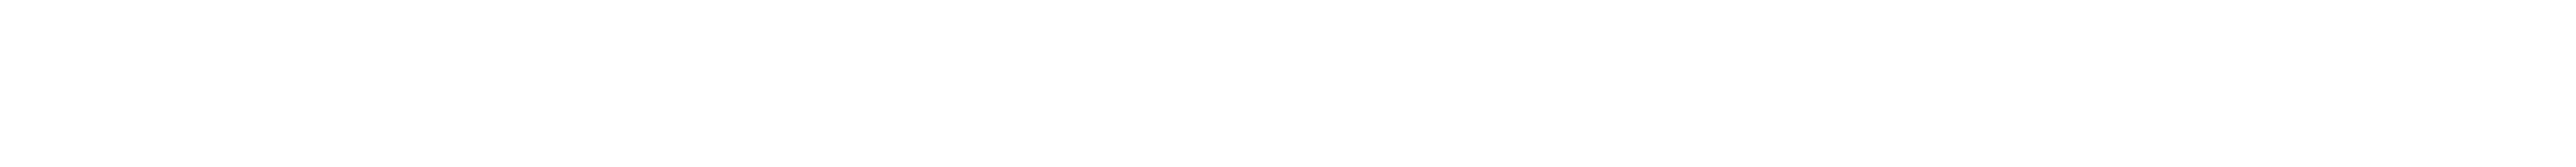 Mala Chetty logo